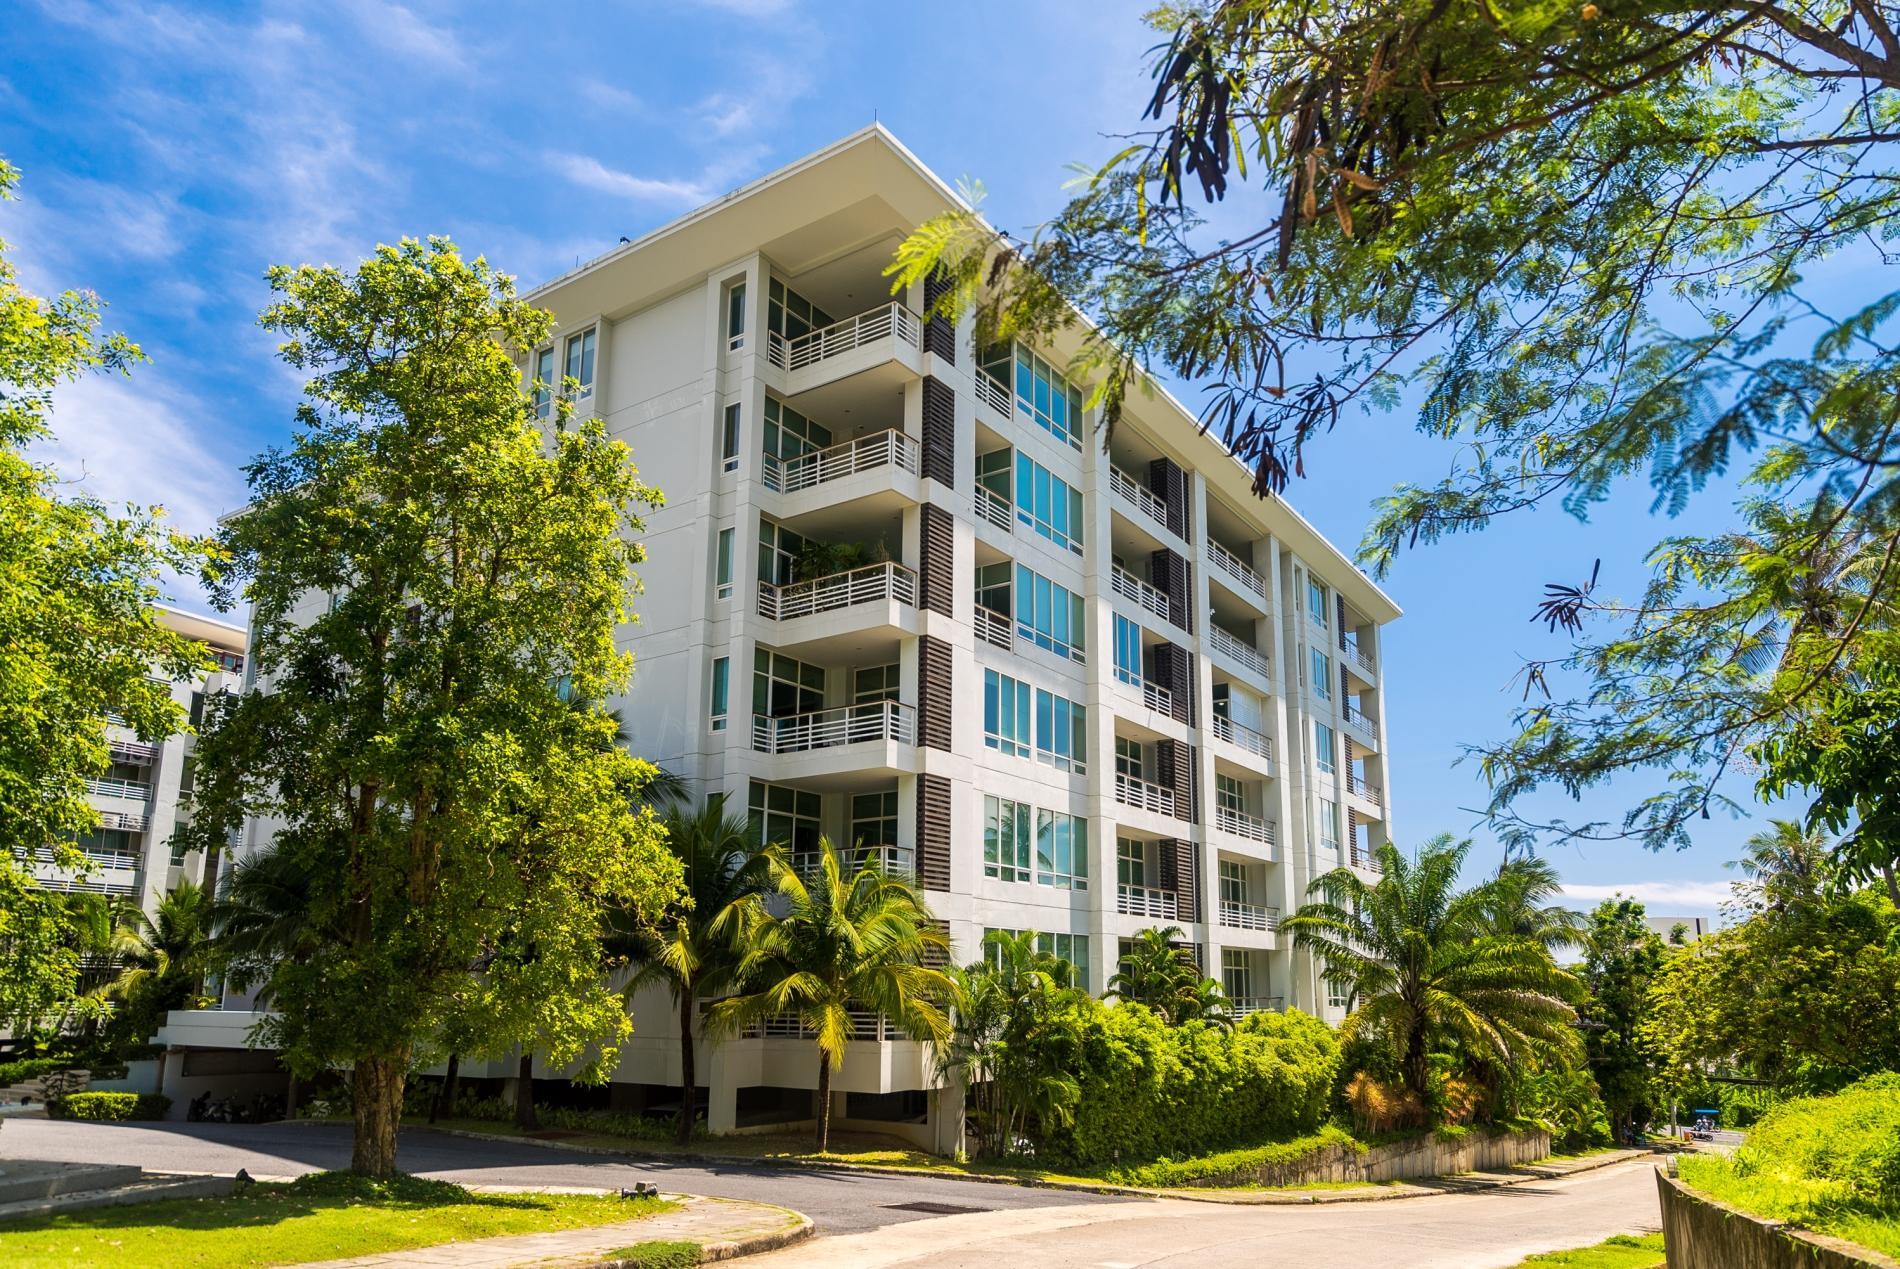 Apartment KH2605 - Sea-view Penthouse in Karon  walk to beach  restaurants  bars  shops photo 18563809